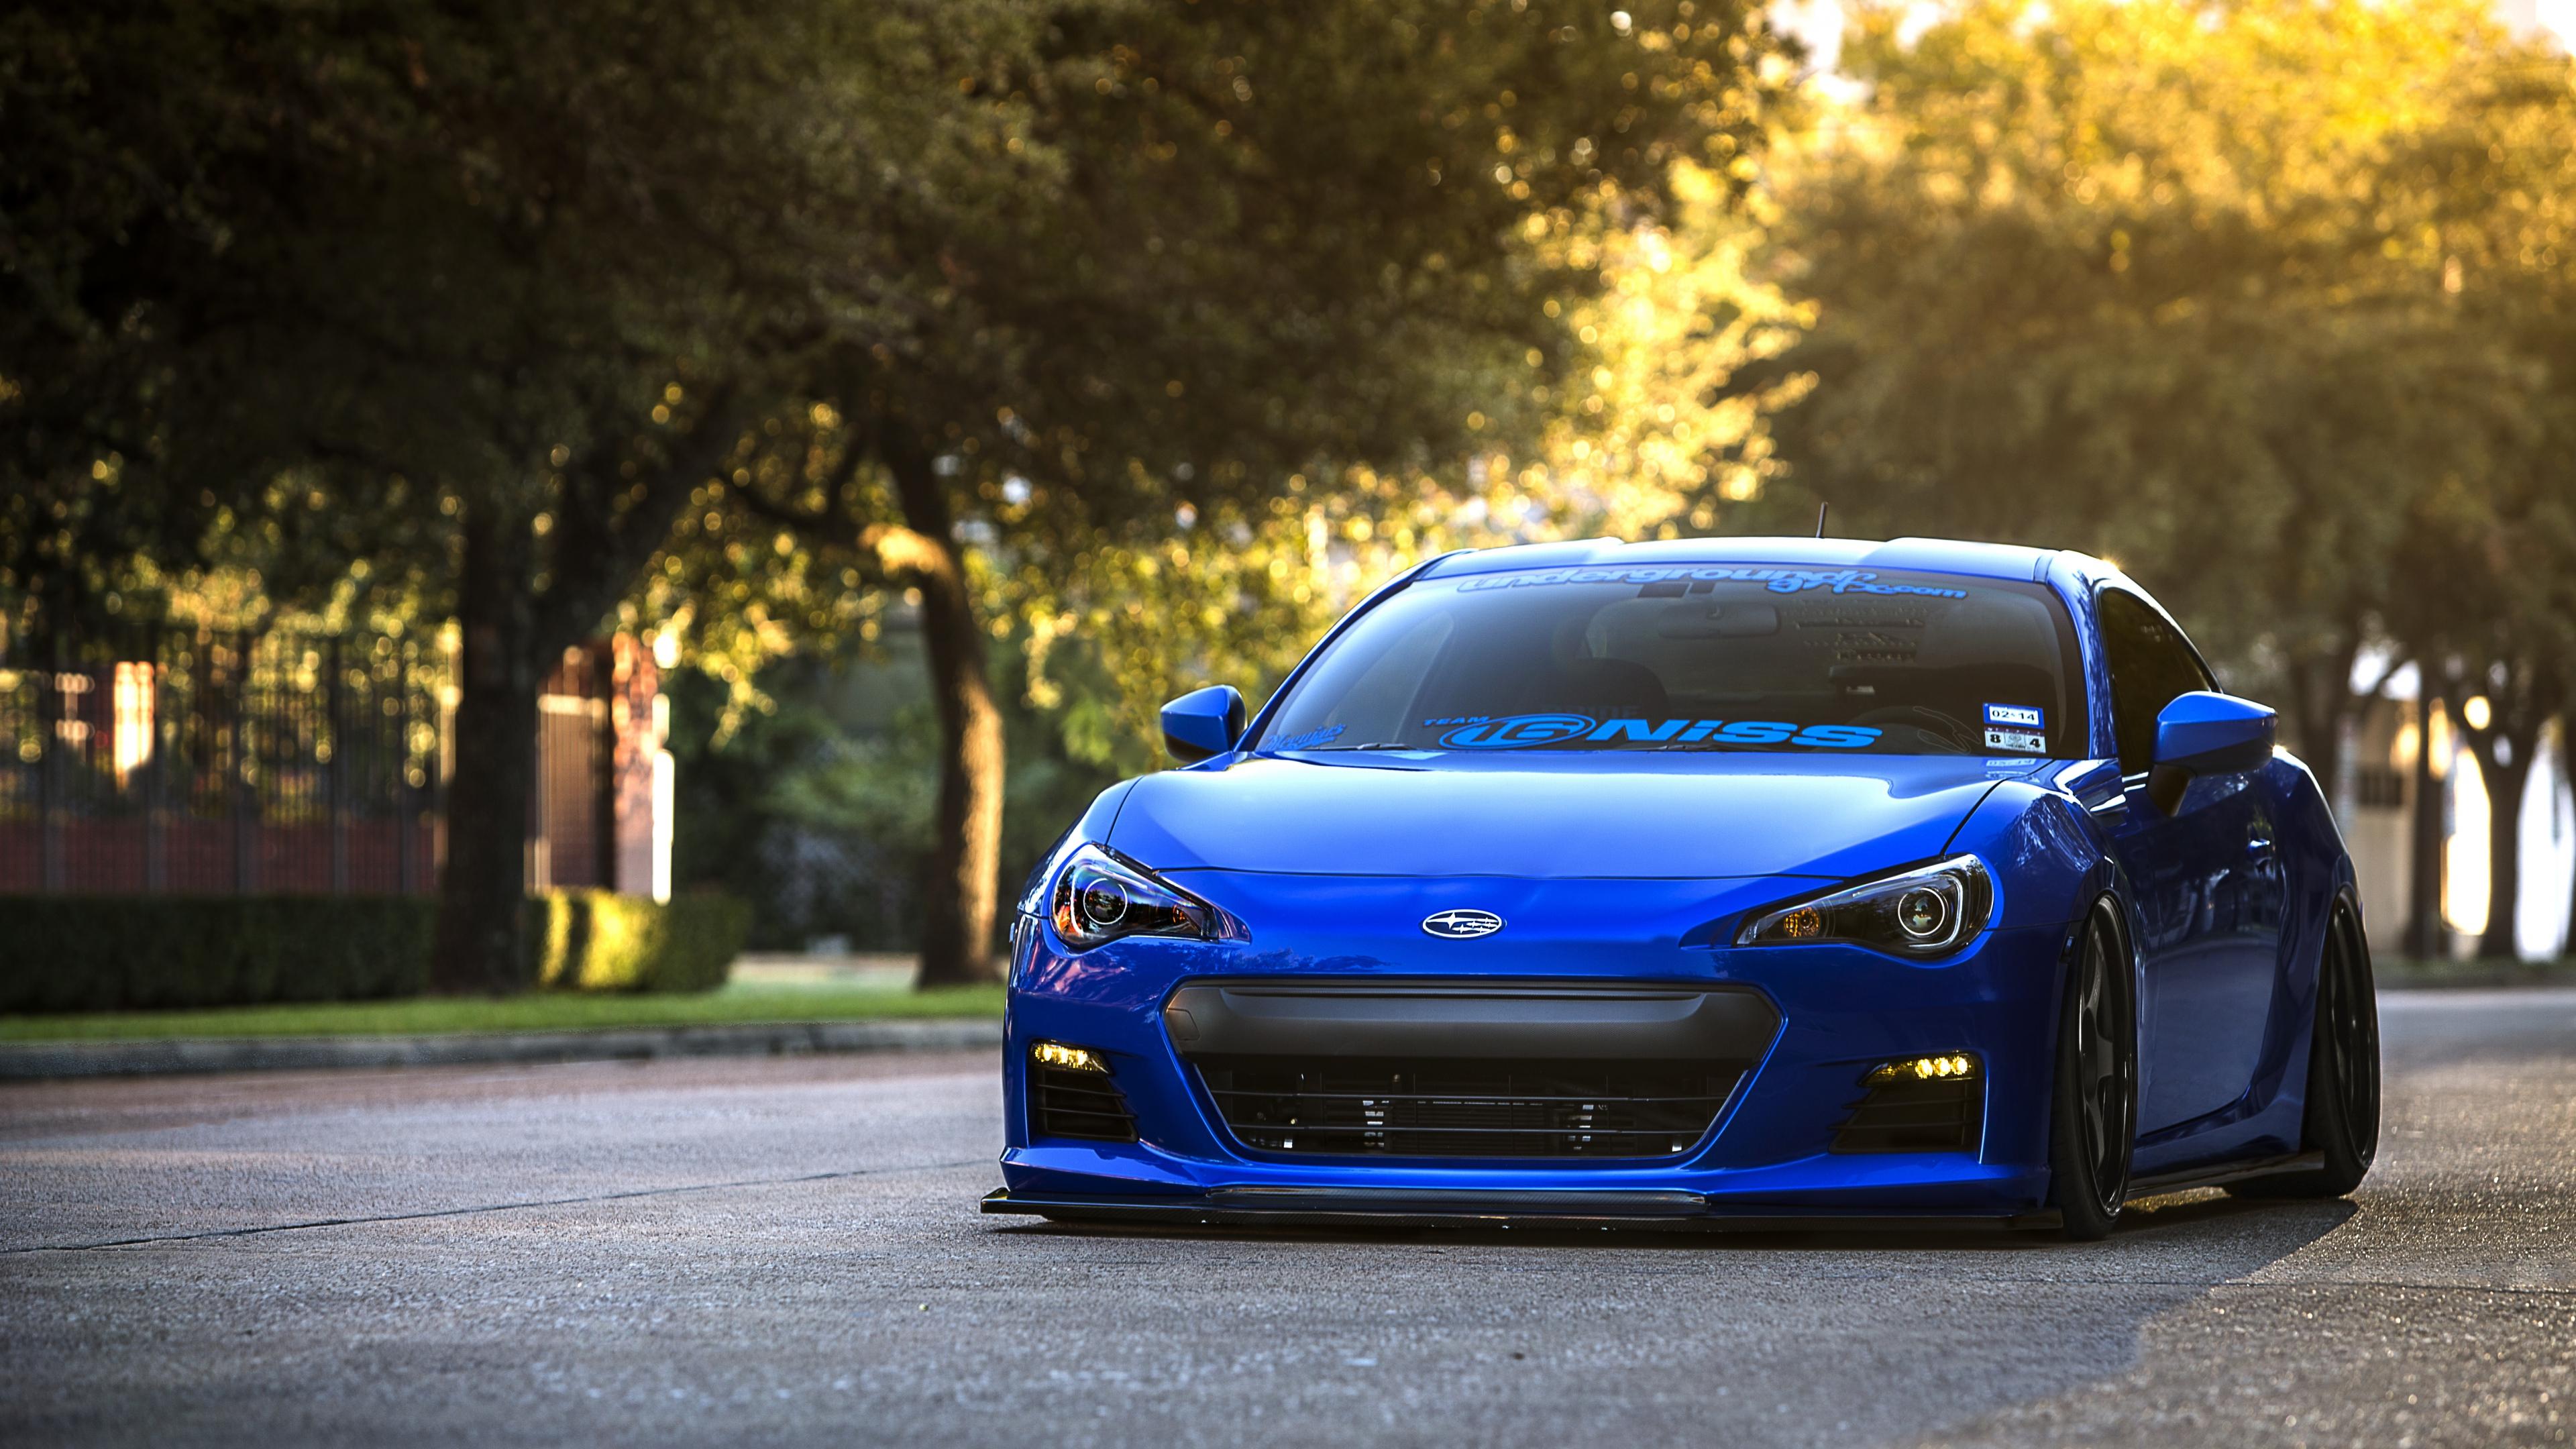 Best 4K Ultra HD Cars Wallpapers Desktop Backgrounds HD Downloads All 3840x2160